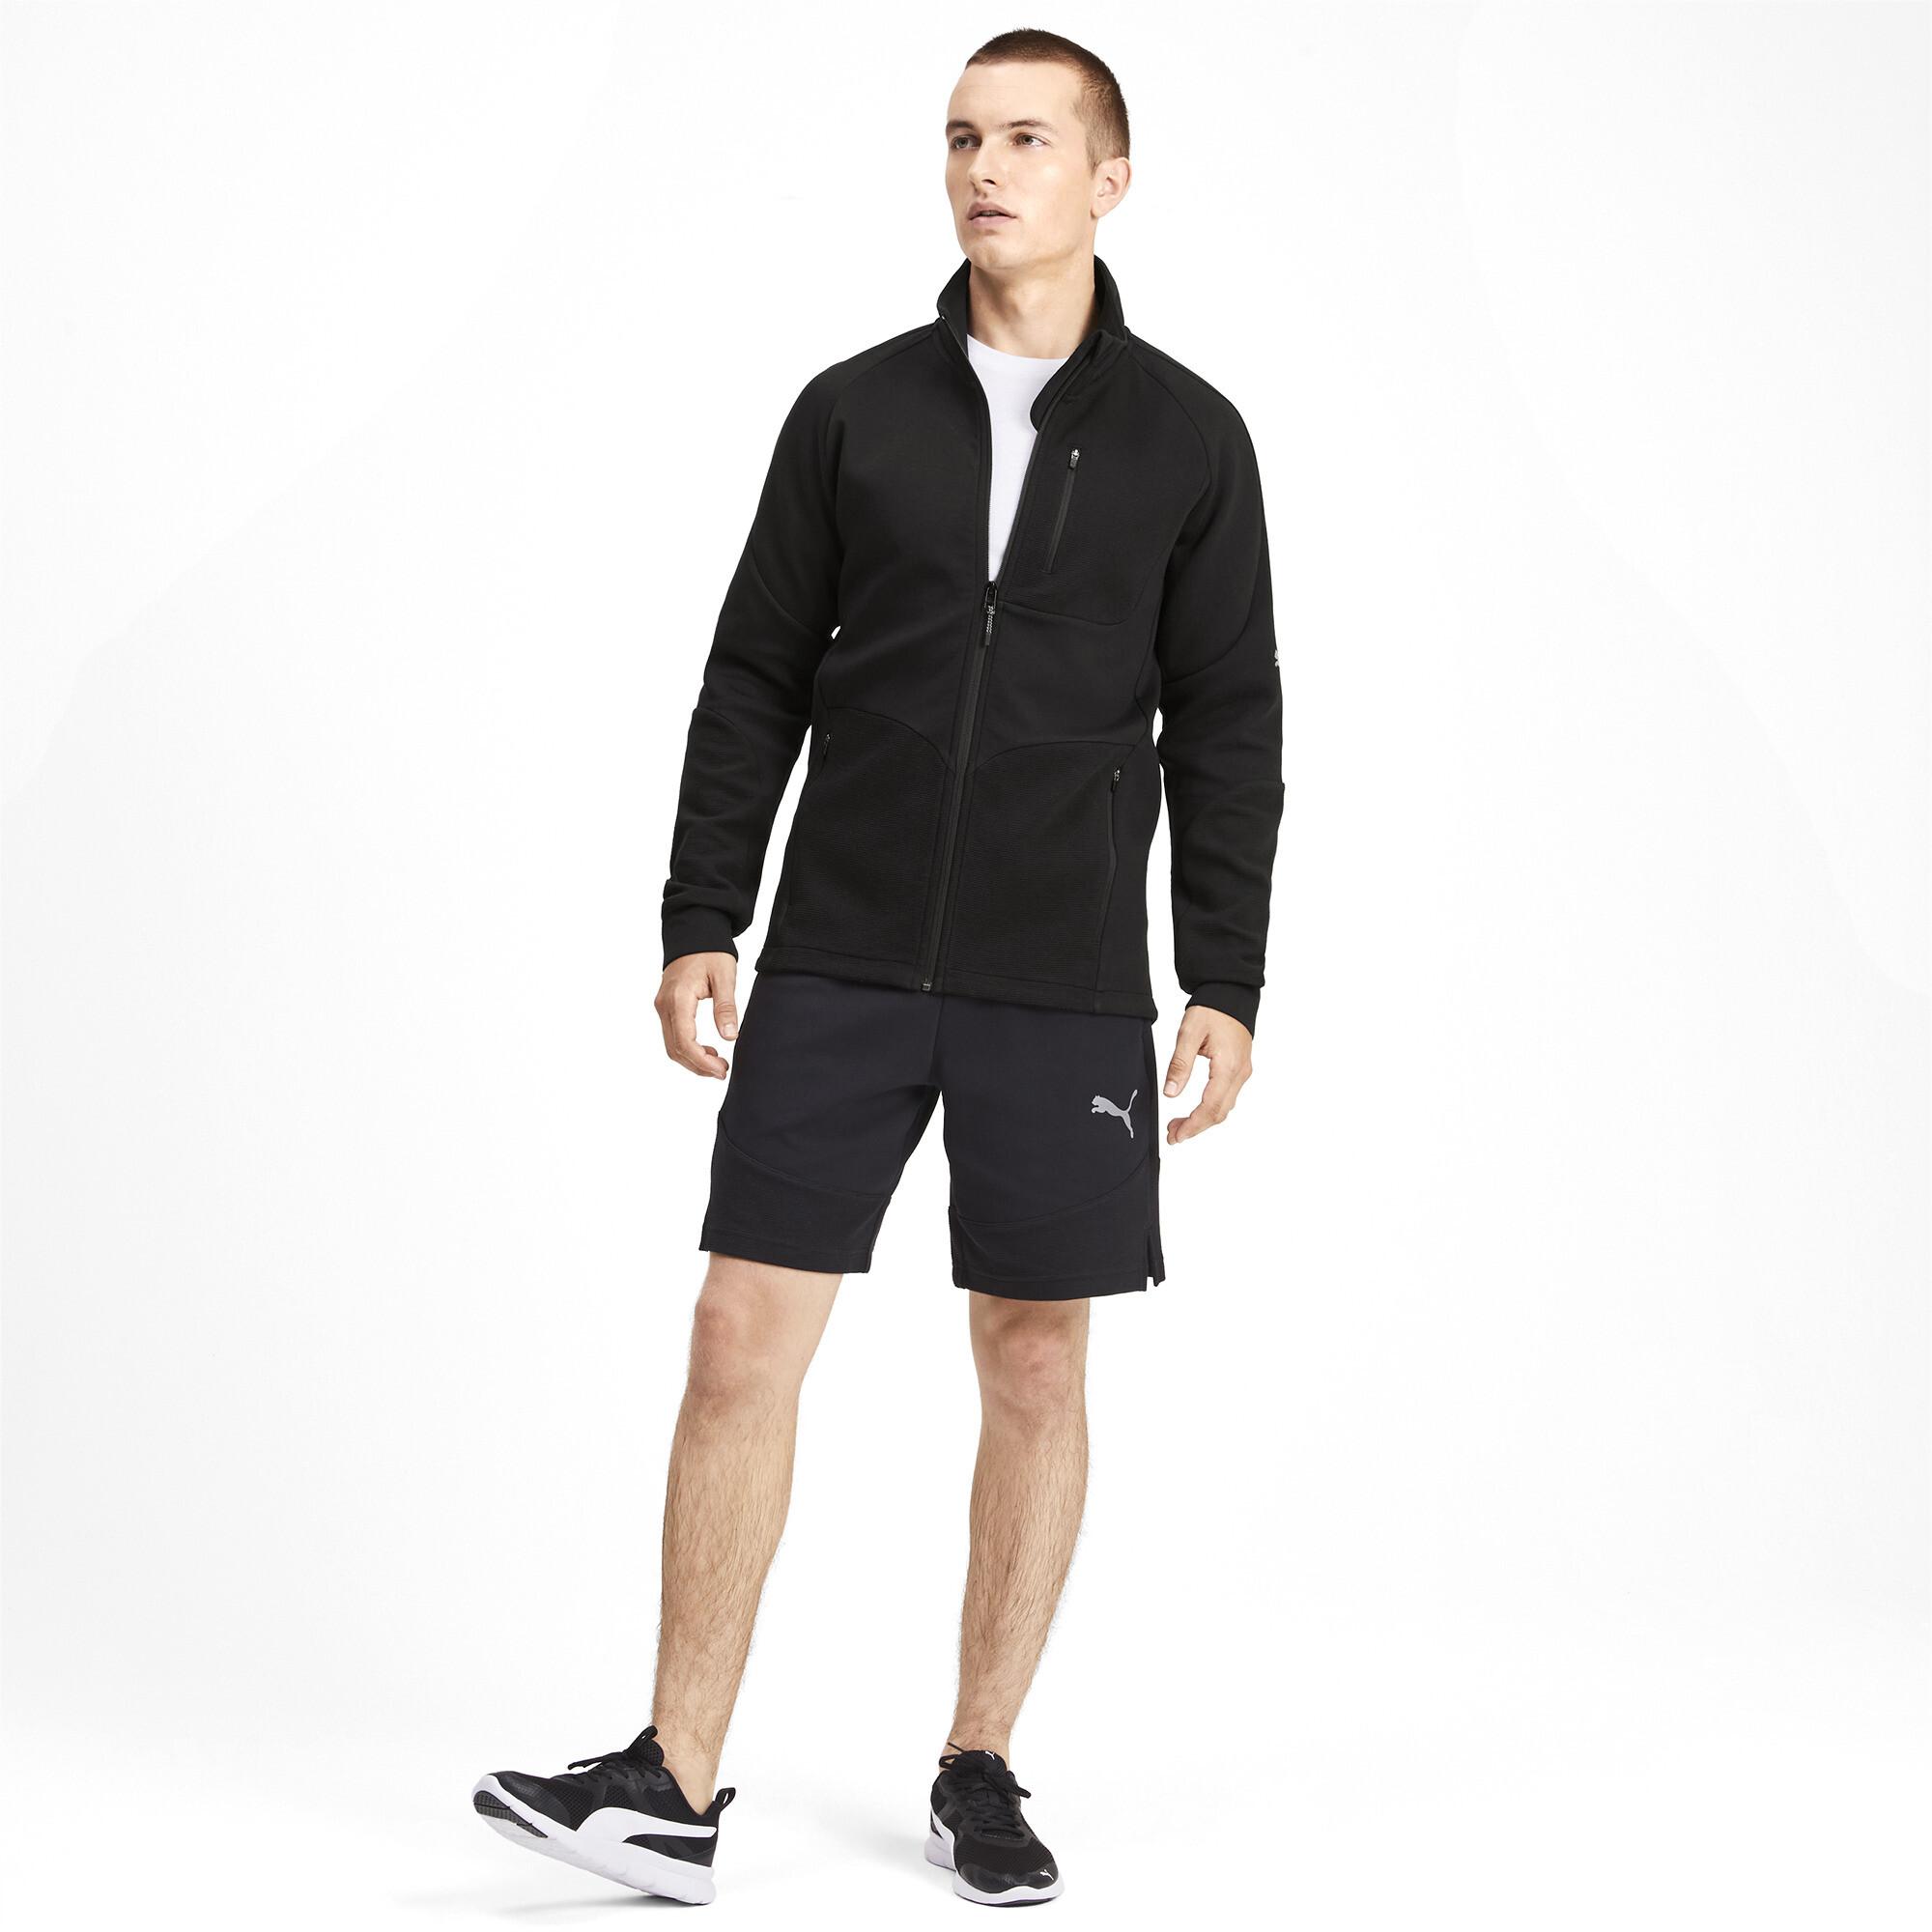 PUMA-Evostripe-Men-039-s-Jacket-Men-Sweat-Basics thumbnail 6